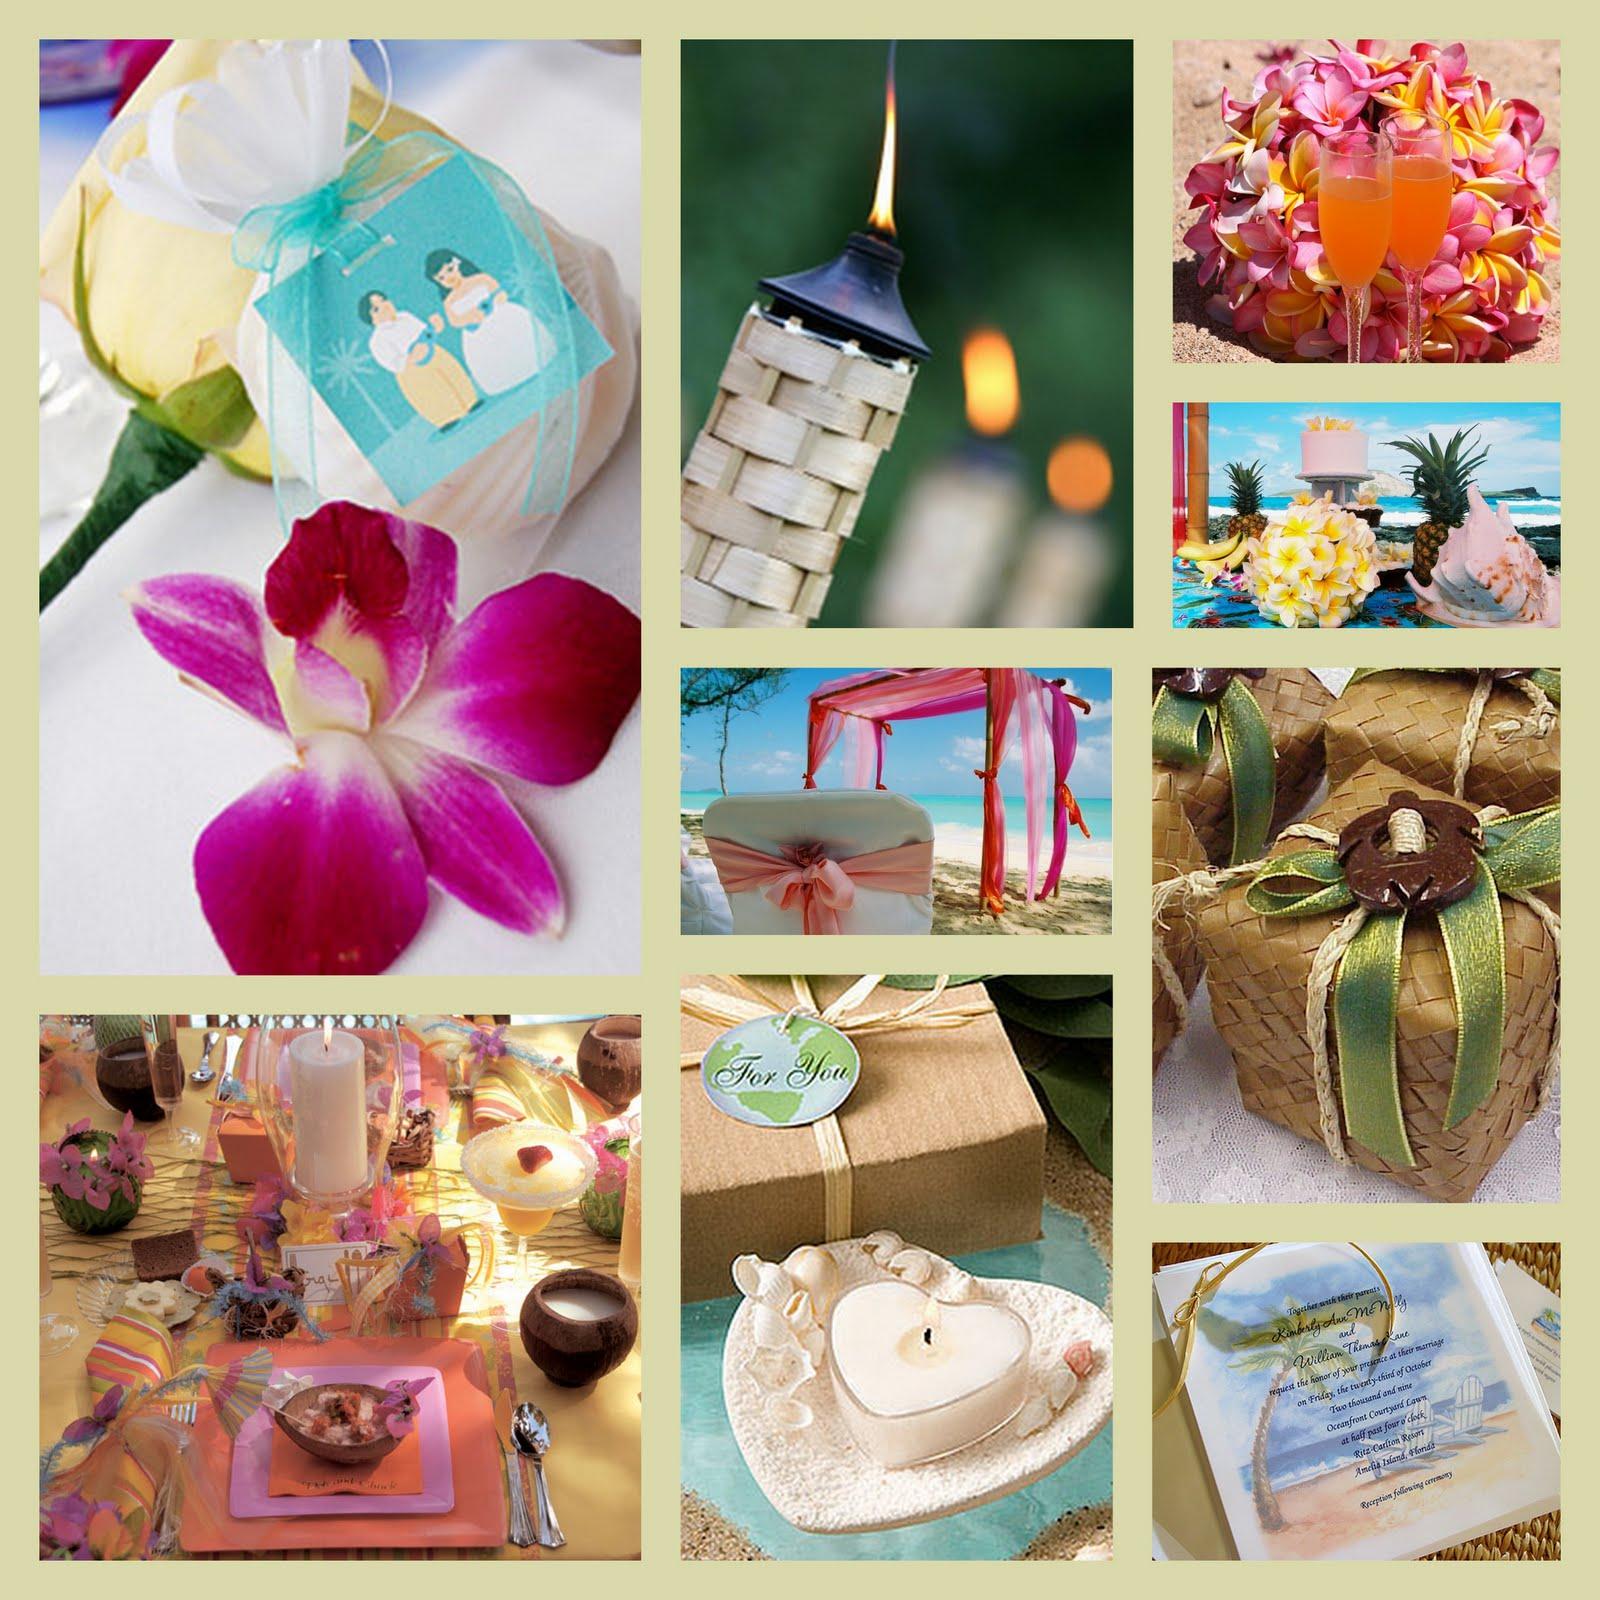 Premier Bride Magazine Texas Wedding Theme Hawaiian Luau